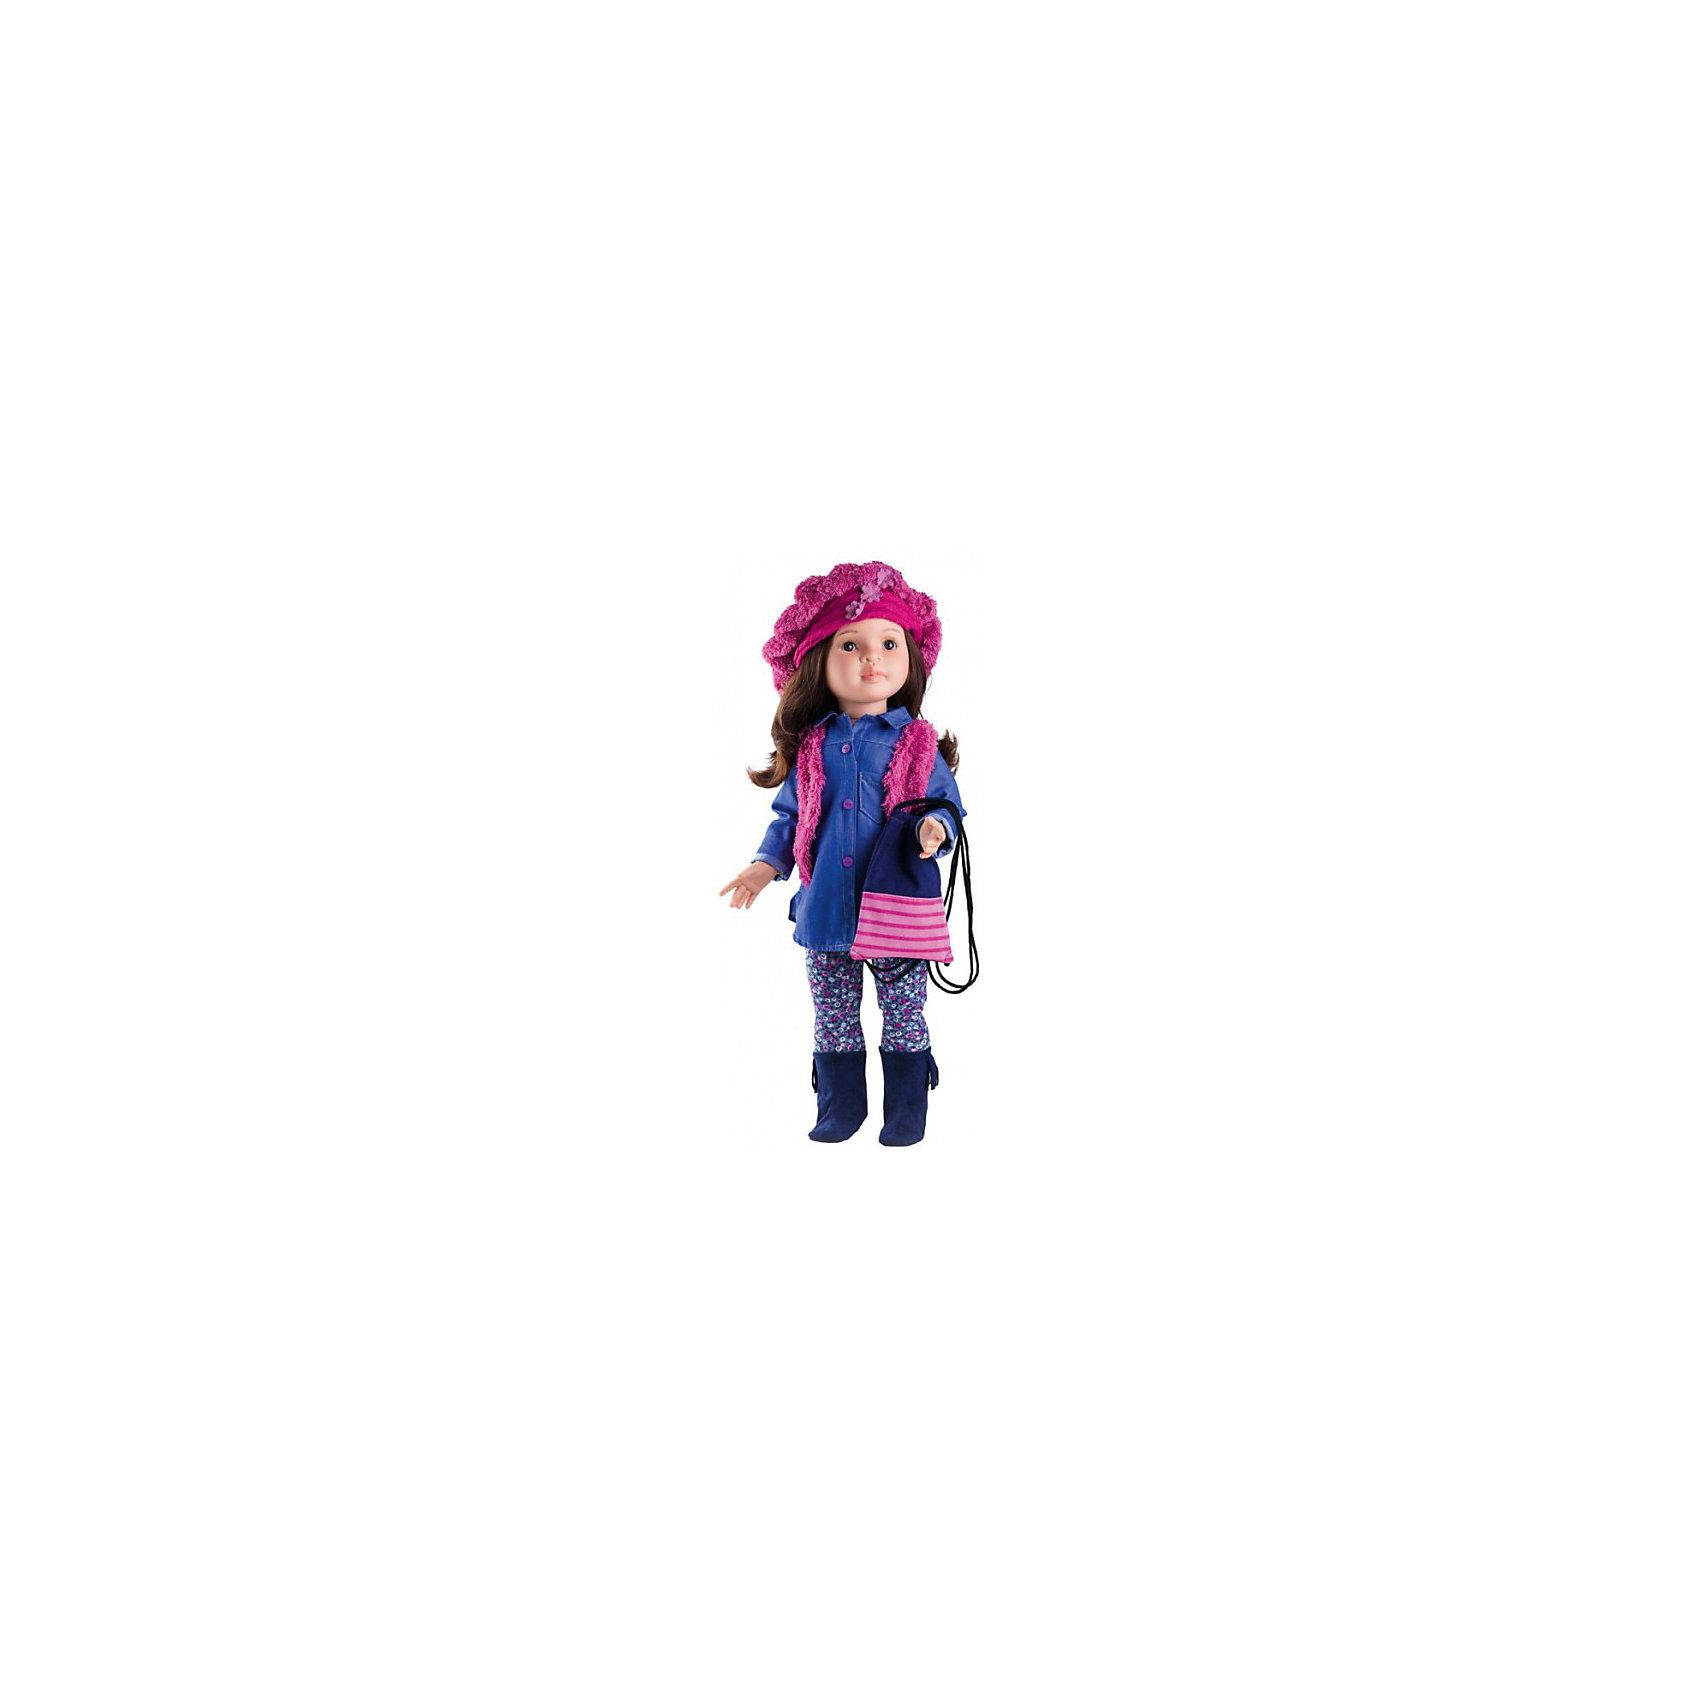 Кукла Paola Reina Лидия, 60 смБренды кукол<br><br><br>Ширина мм: 175<br>Глубина мм: 340<br>Высота мм: 690<br>Вес г: 1750<br>Возраст от месяцев: 36<br>Возраст до месяцев: 144<br>Пол: Женский<br>Возраст: Детский<br>SKU: 7118829